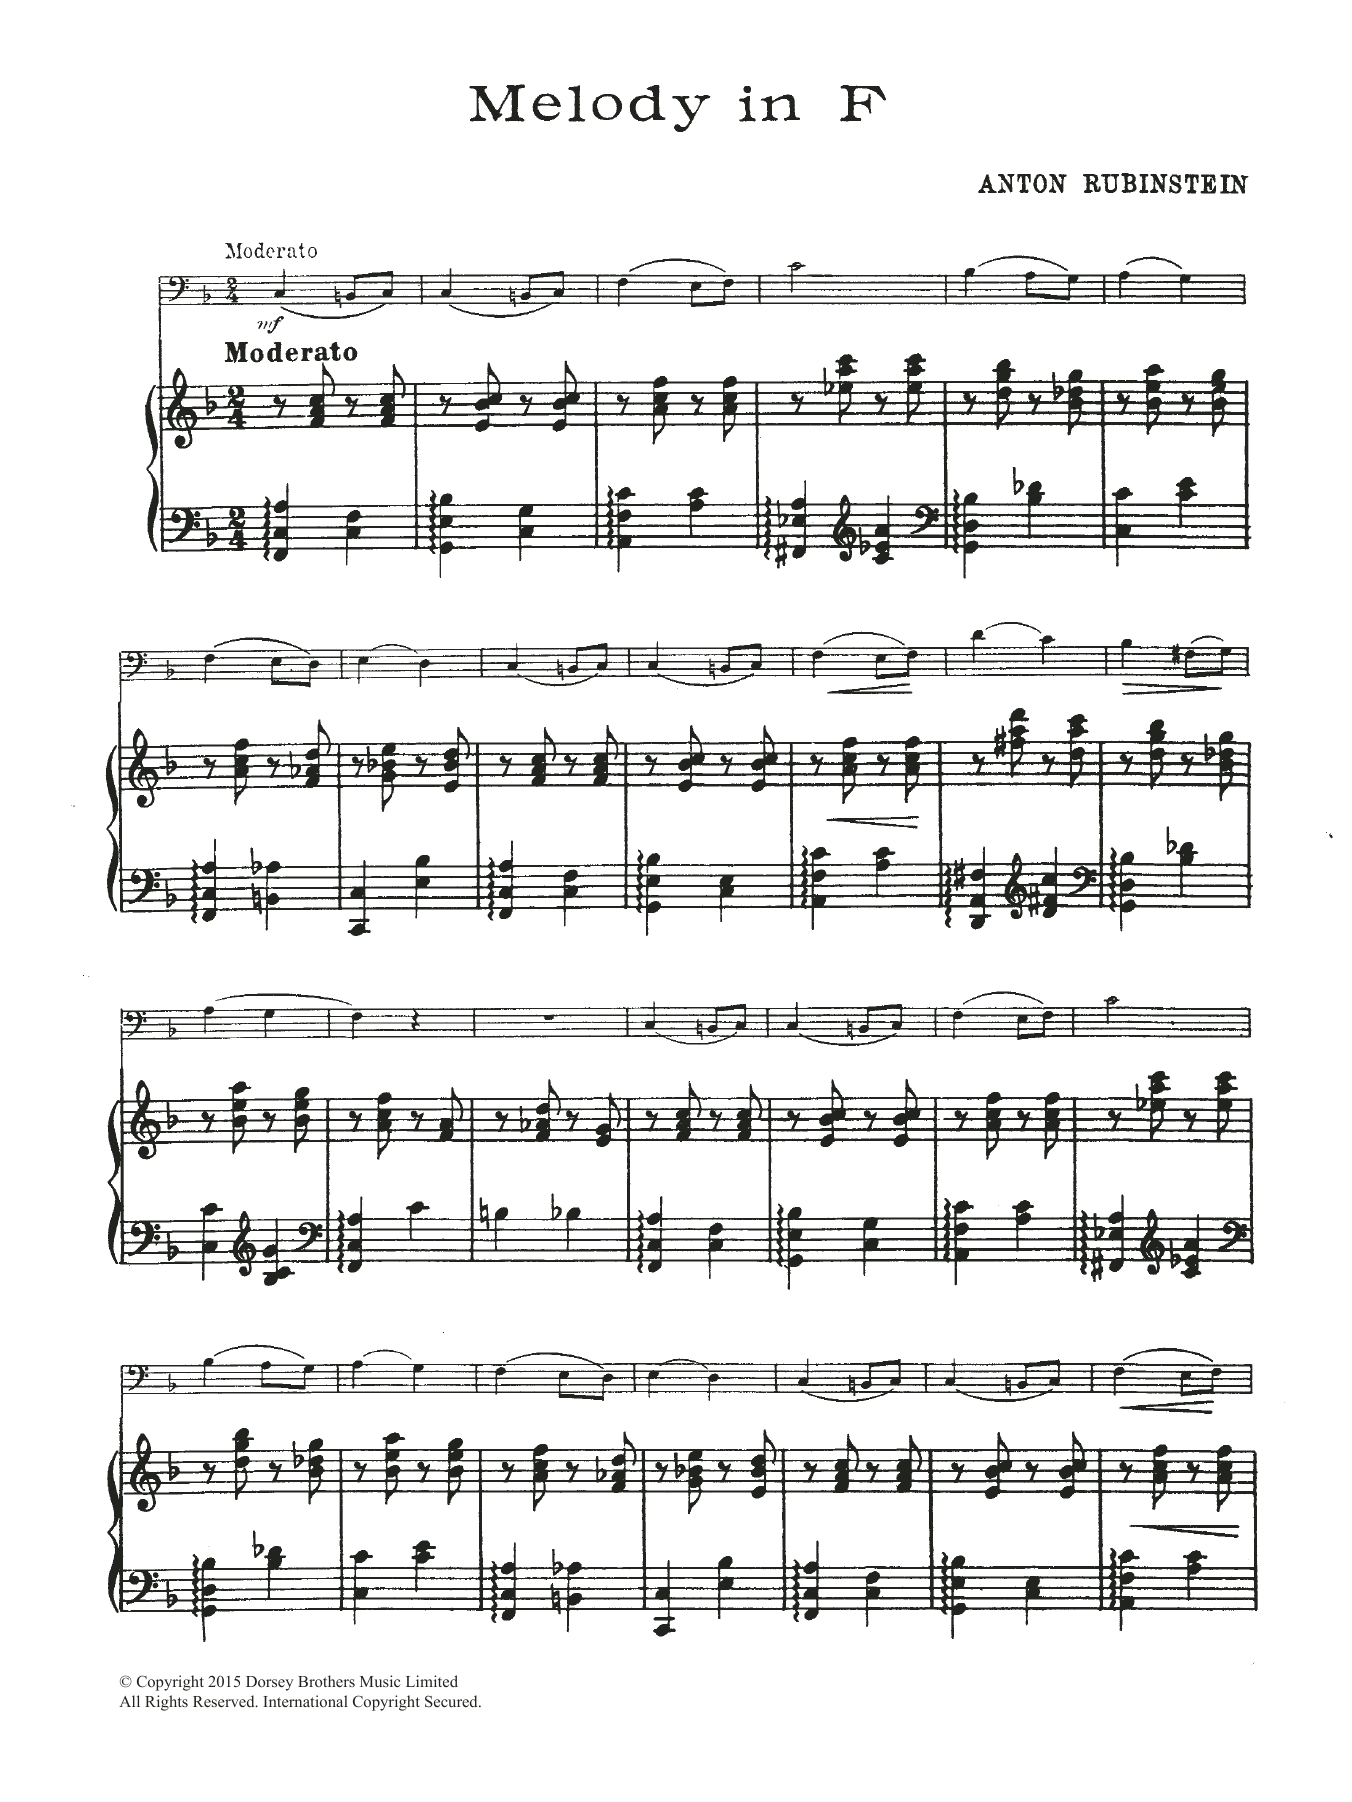 Anton Rubinstein - Melody In F